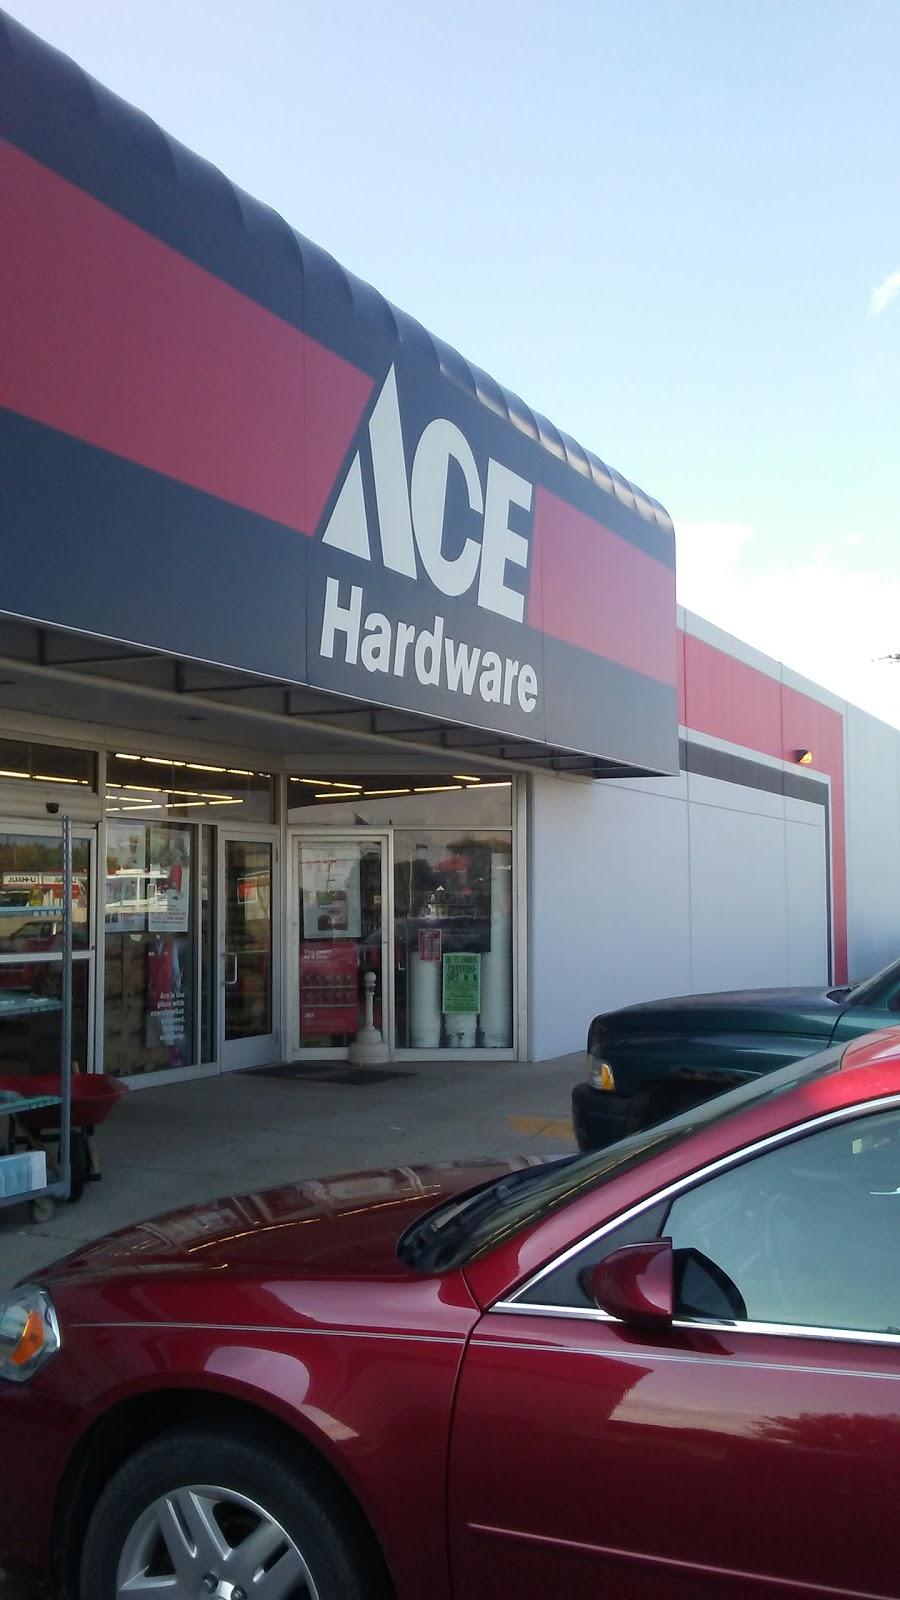 St. Pierre Ace Hardware - hardware store  | Photo 8 of 10 | Address: 1490 Stewart Rd, Monroe, MI 48162, USA | Phone: (734) 243-6180